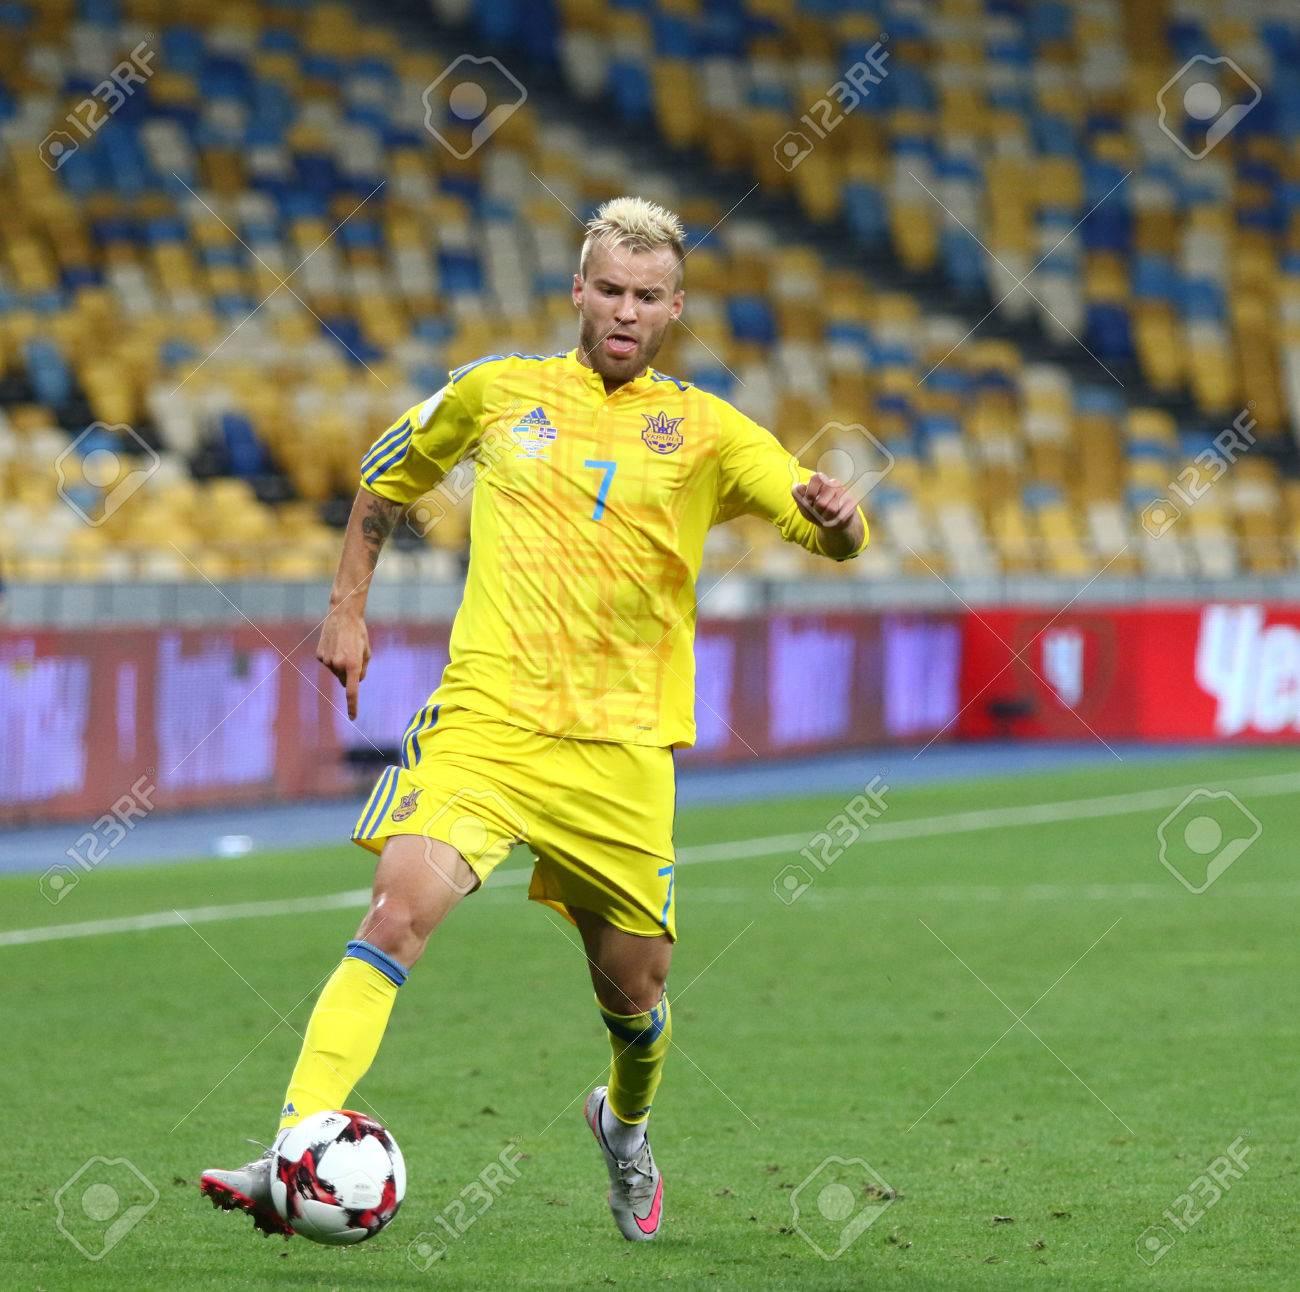 KYIV UKRAINE SEPTEMBER 5 2016 Andriy Yarmolenko Ukraine